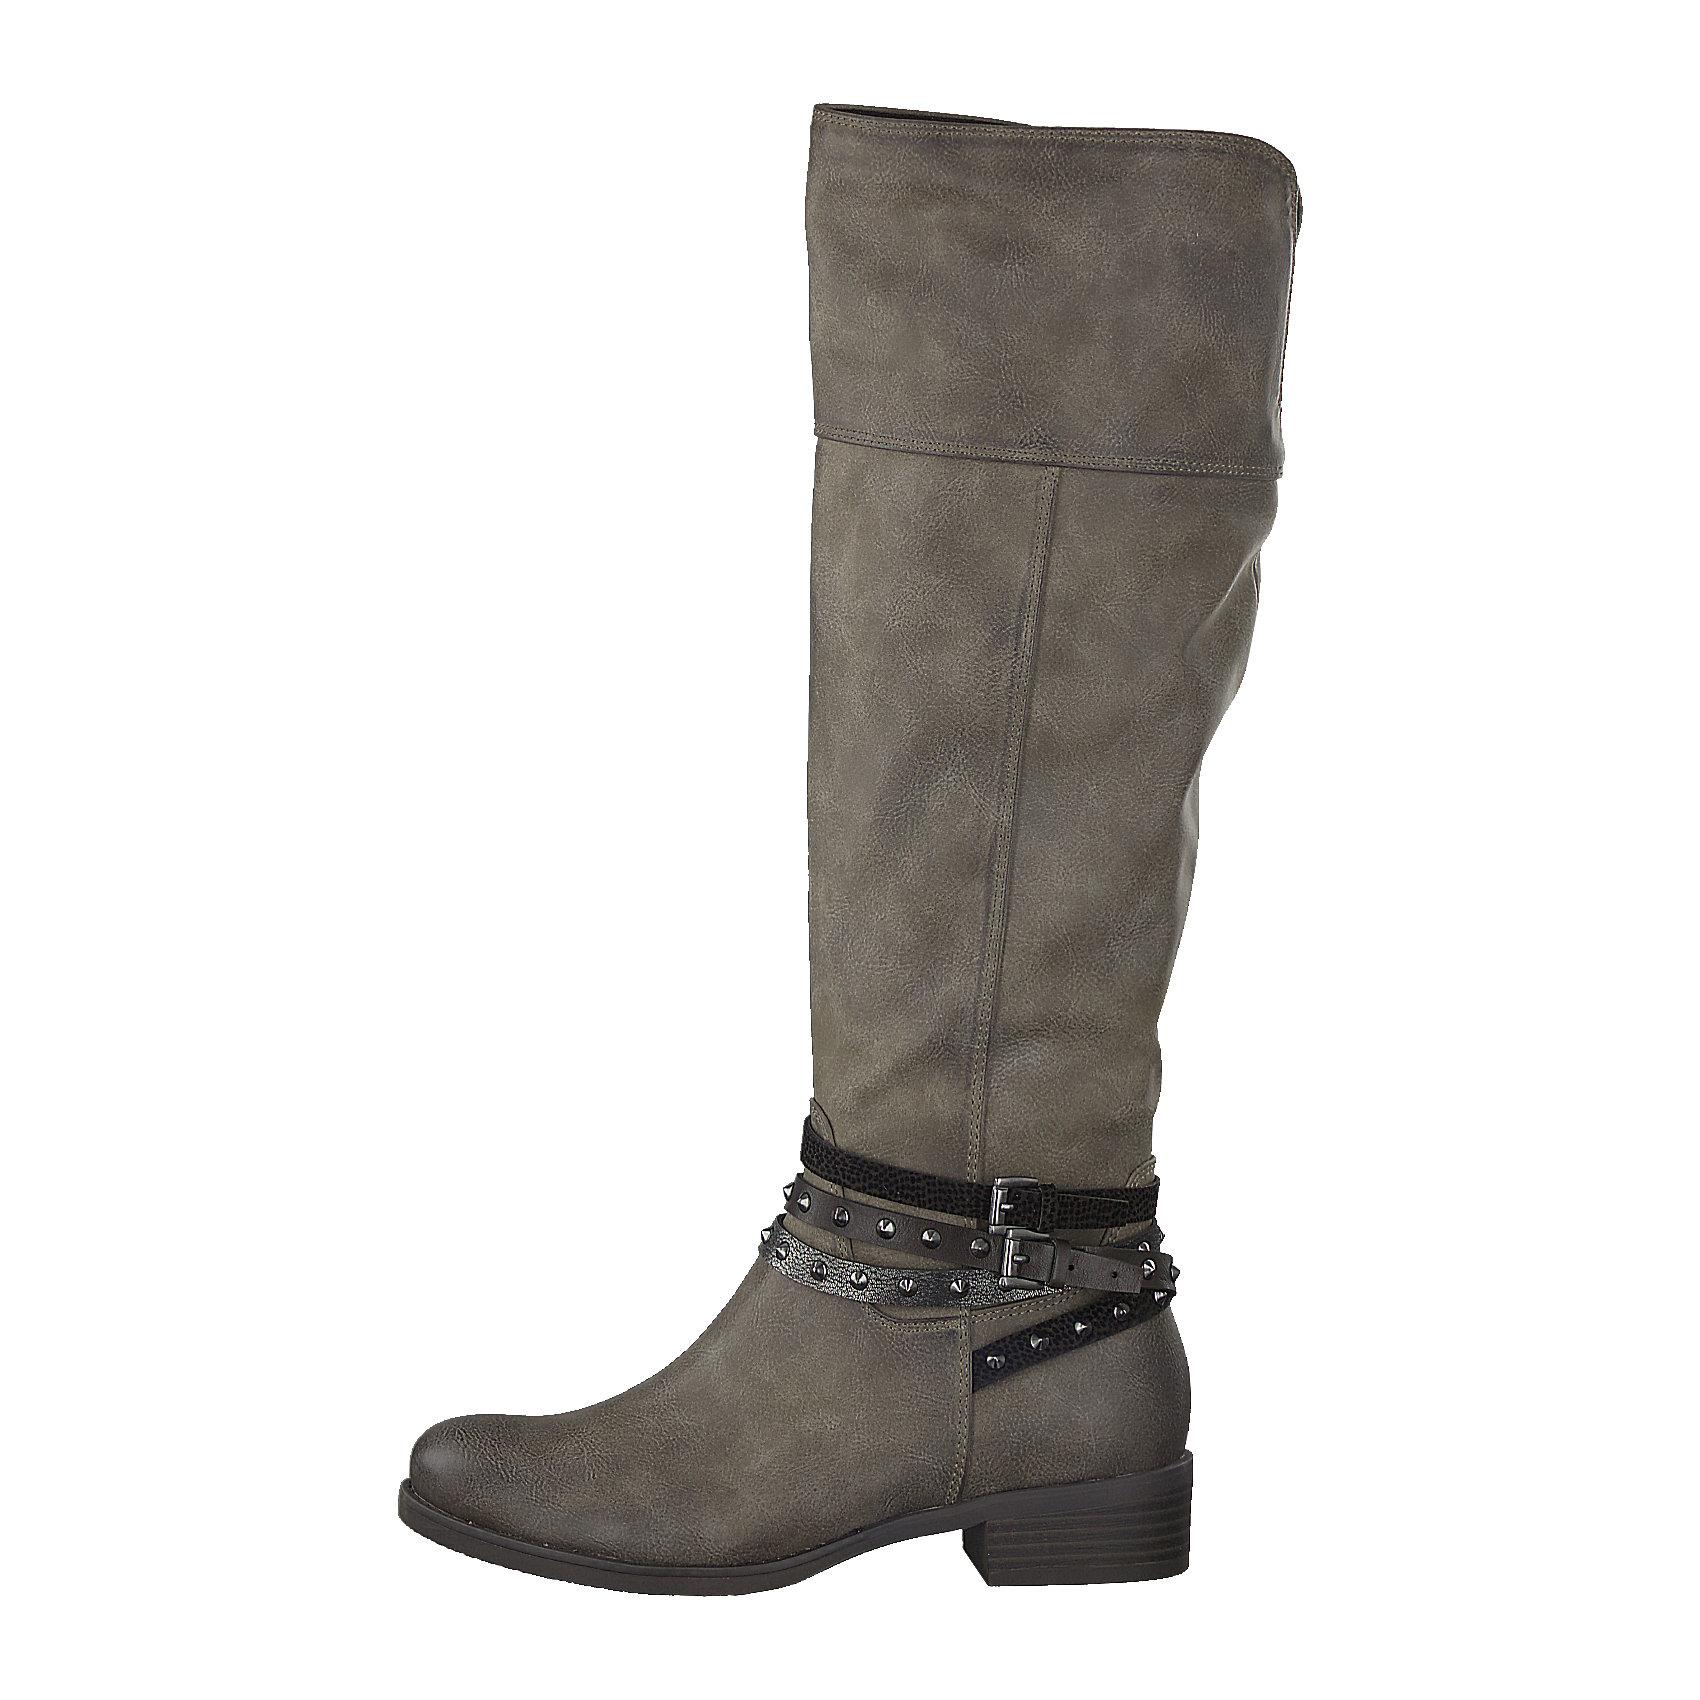 huge selection of ddfb9 bbda6 Details zu Neu MARCO TOZZI Stiefel 6993090 für Damen dunkelgrau grau